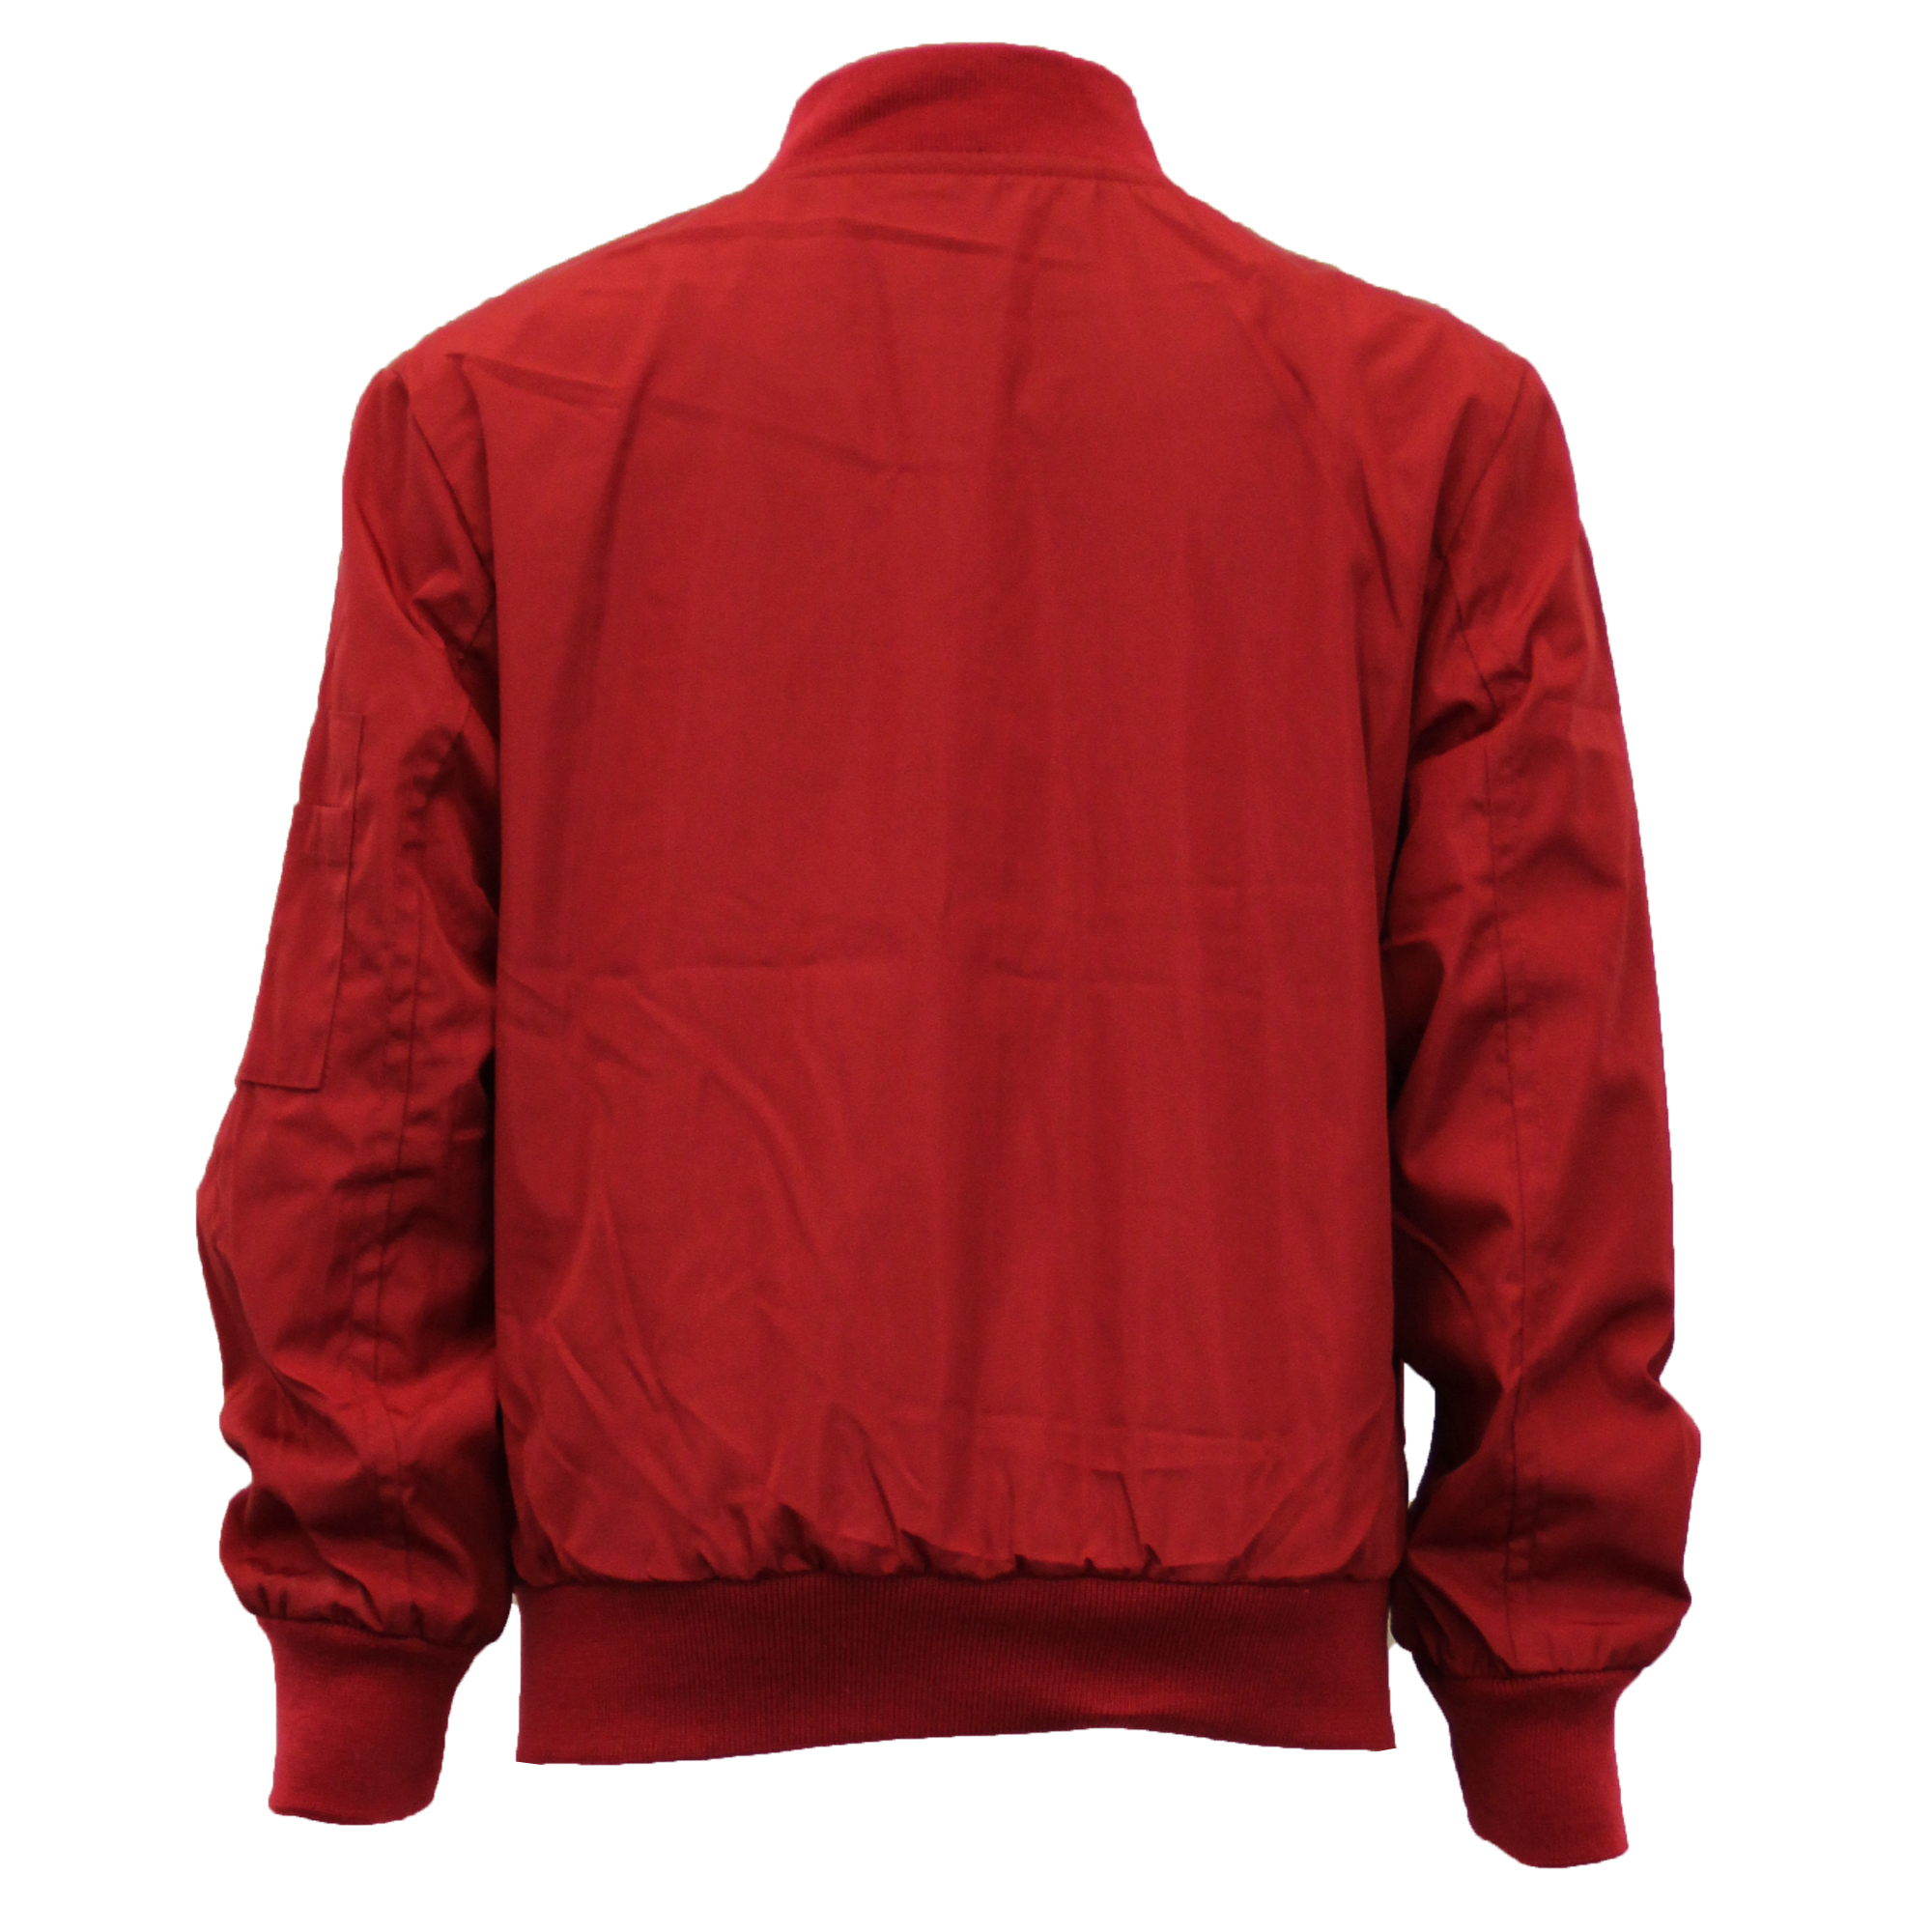 boys summer jacket kids badges MA1 military lined flight army baseball coat new